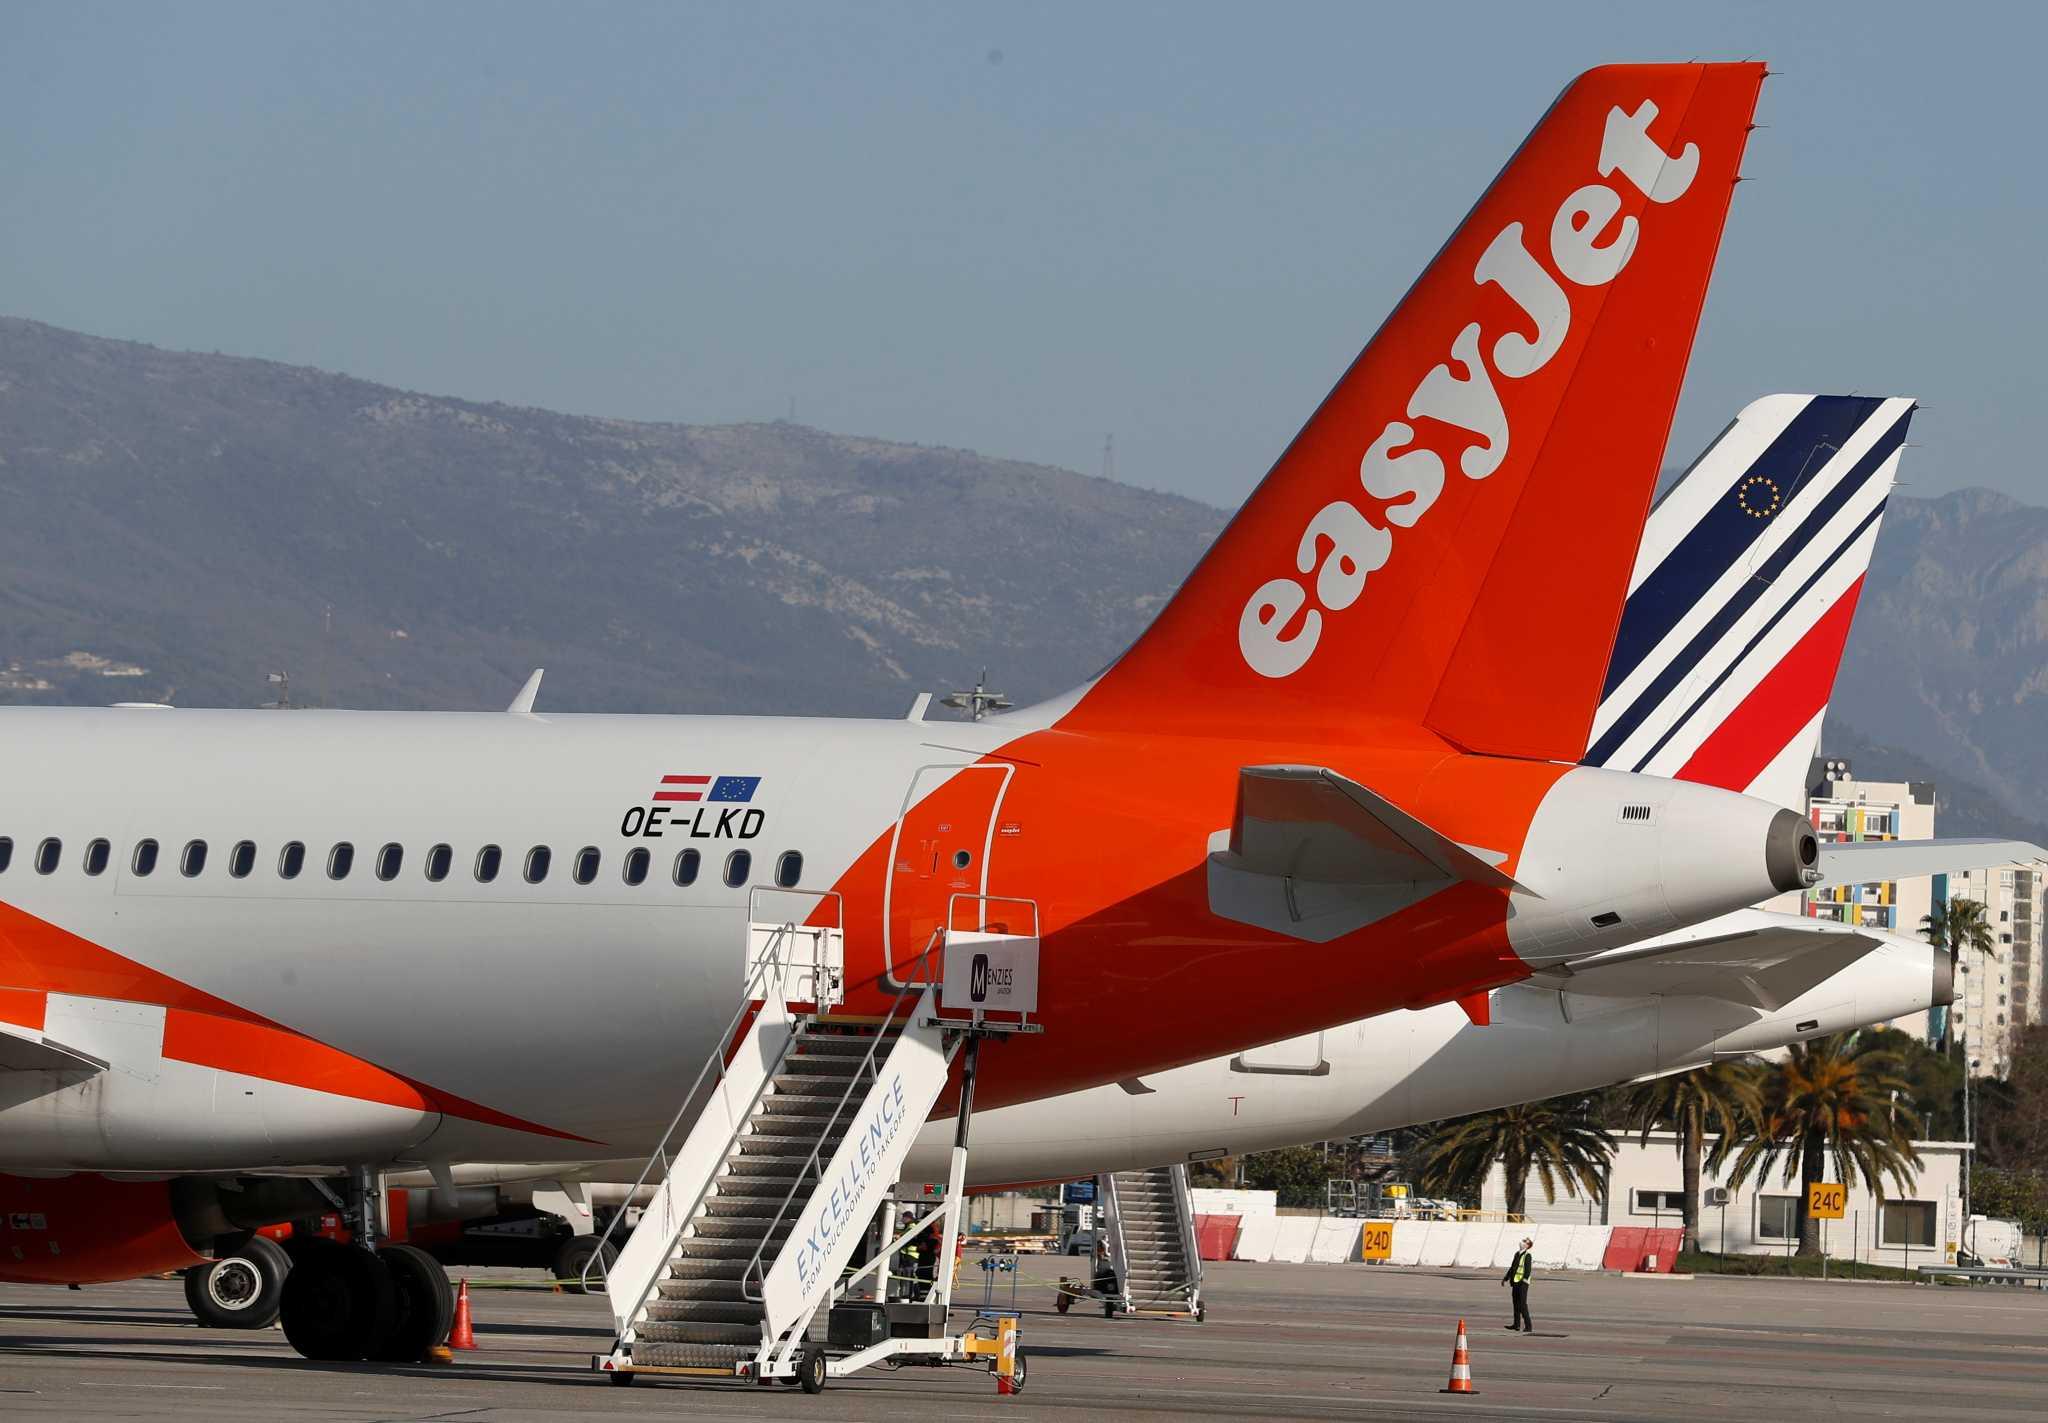 EasyJet: Αισιοδοξία για επιστροφή στην κανονικότητα από τα τέλη Μαΐου